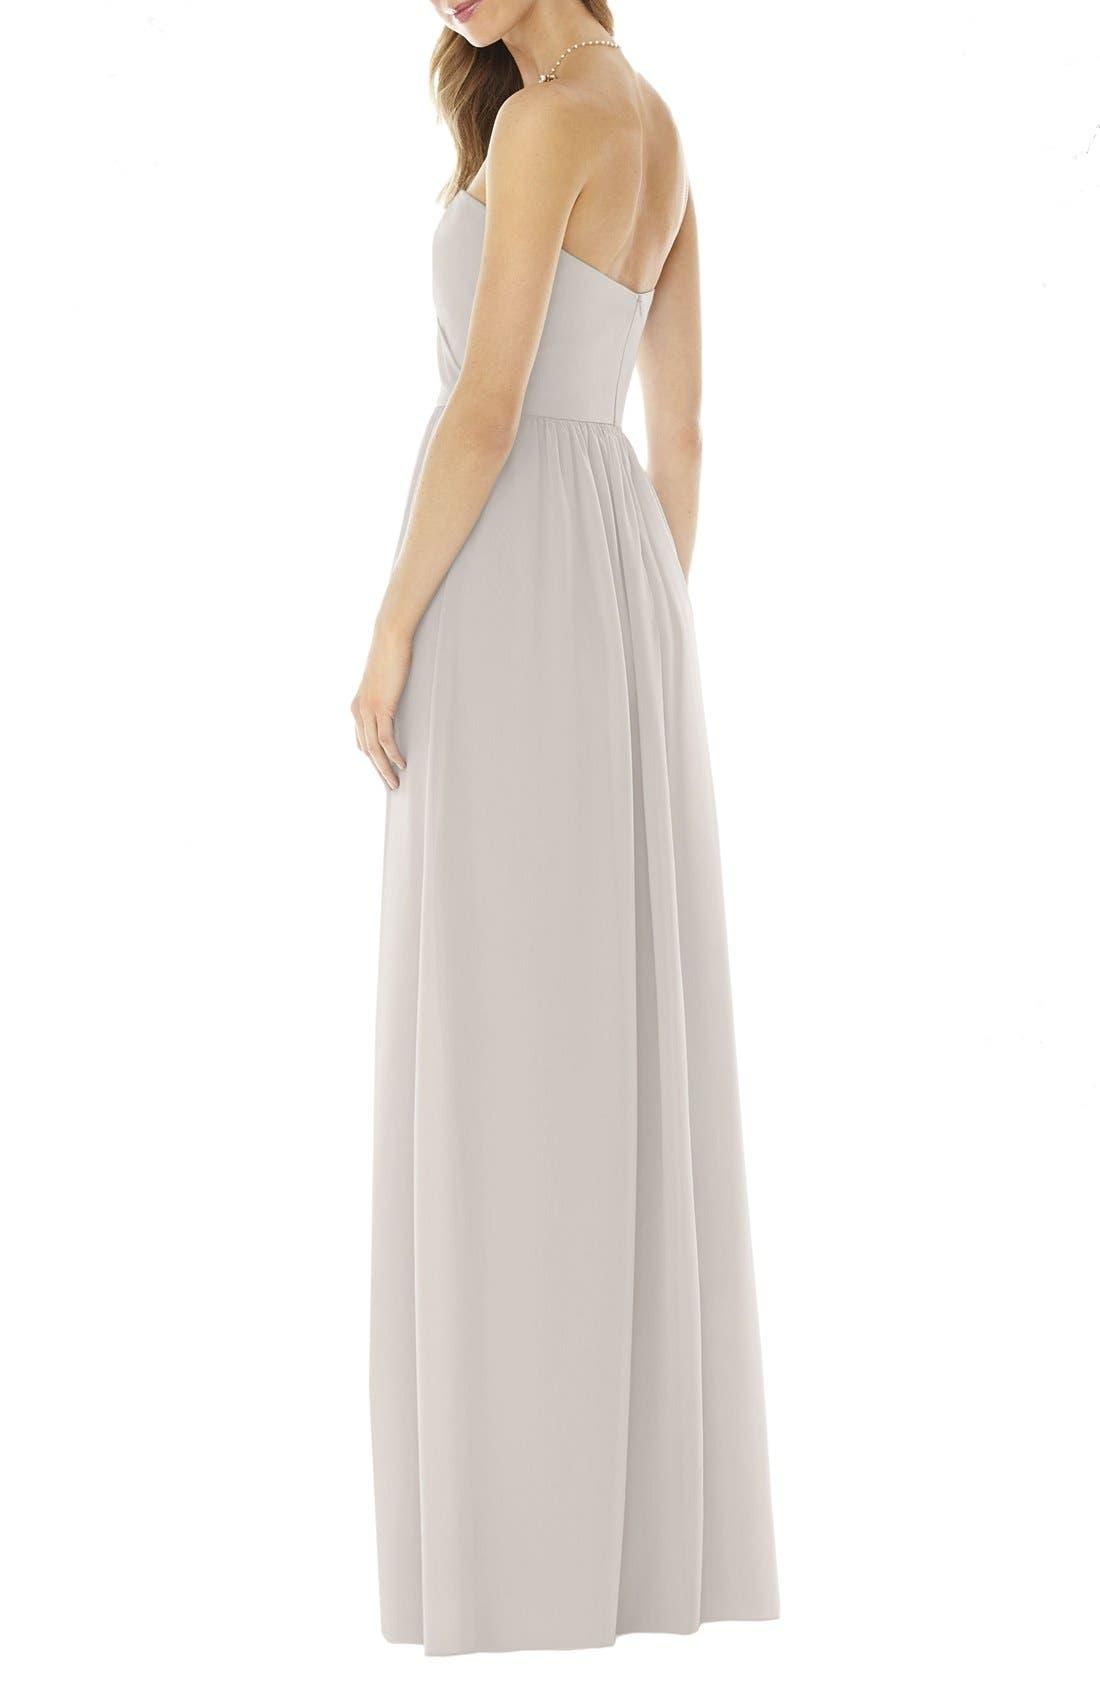 49e56945fa73 Grey Bridesmaid Dresses | Nordstrom